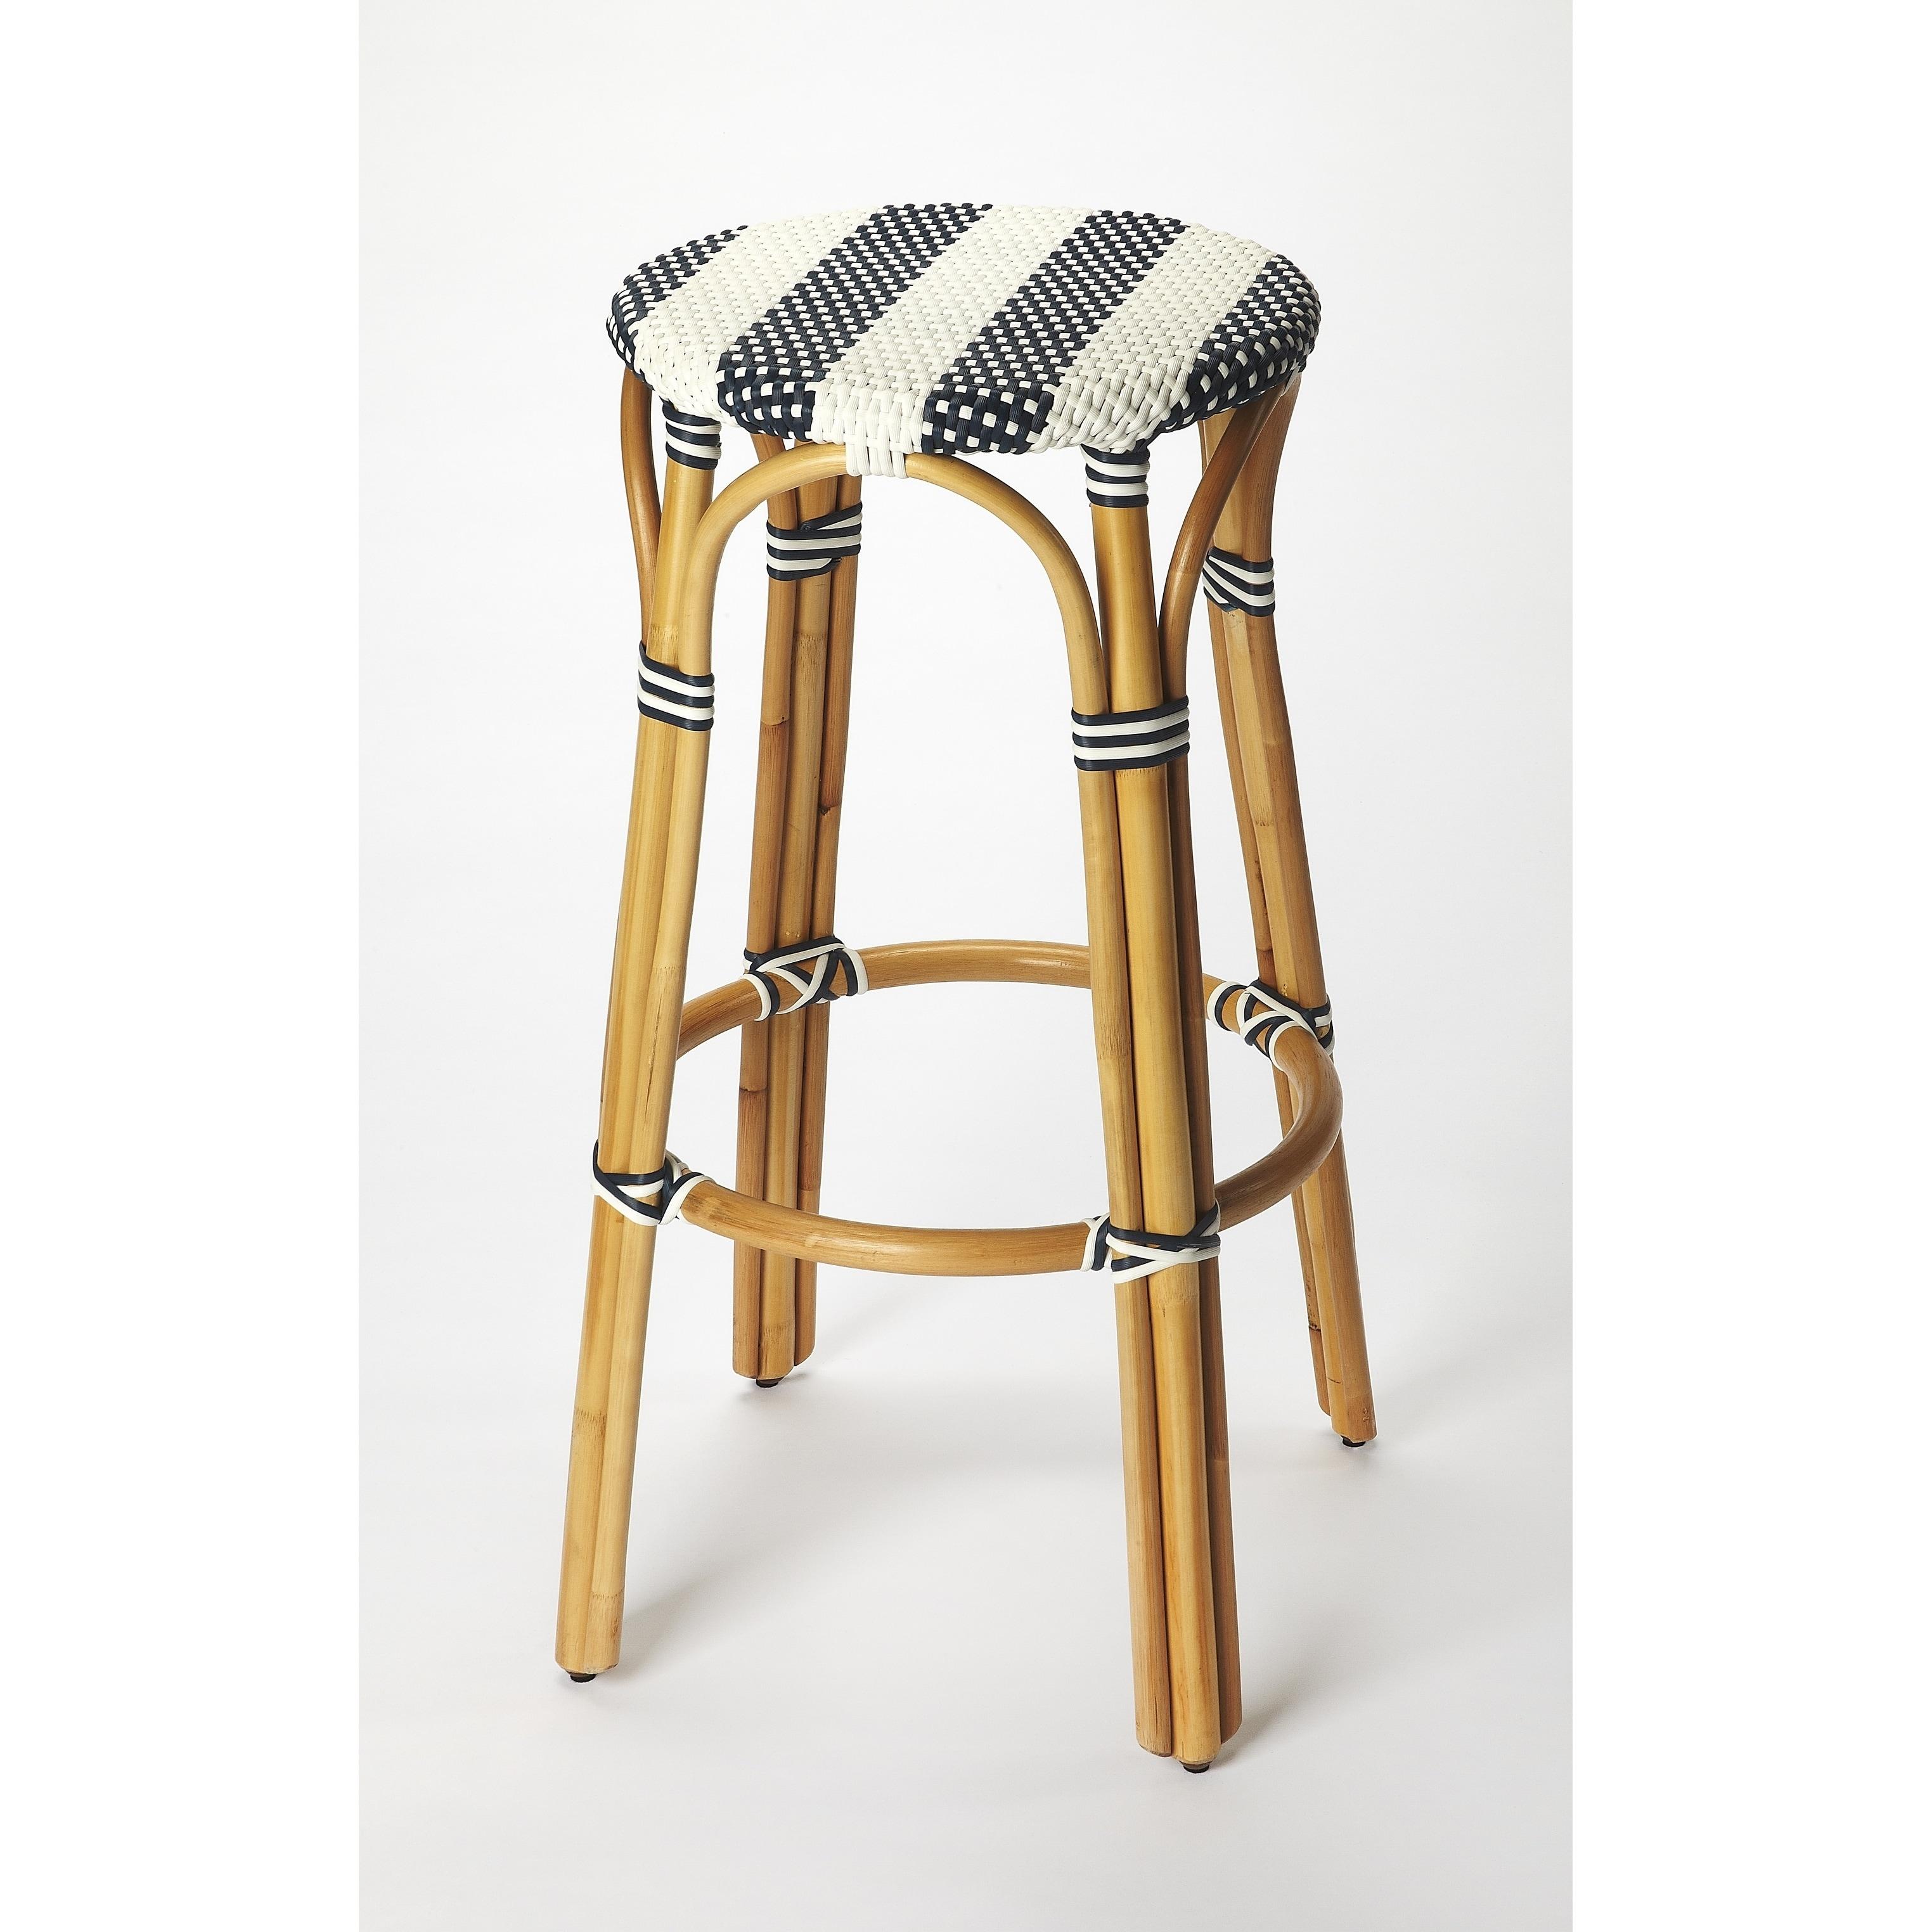 Handmade Butler Tobias Blue And White Rattan Bar Stool Indonesia Overstock 18072644